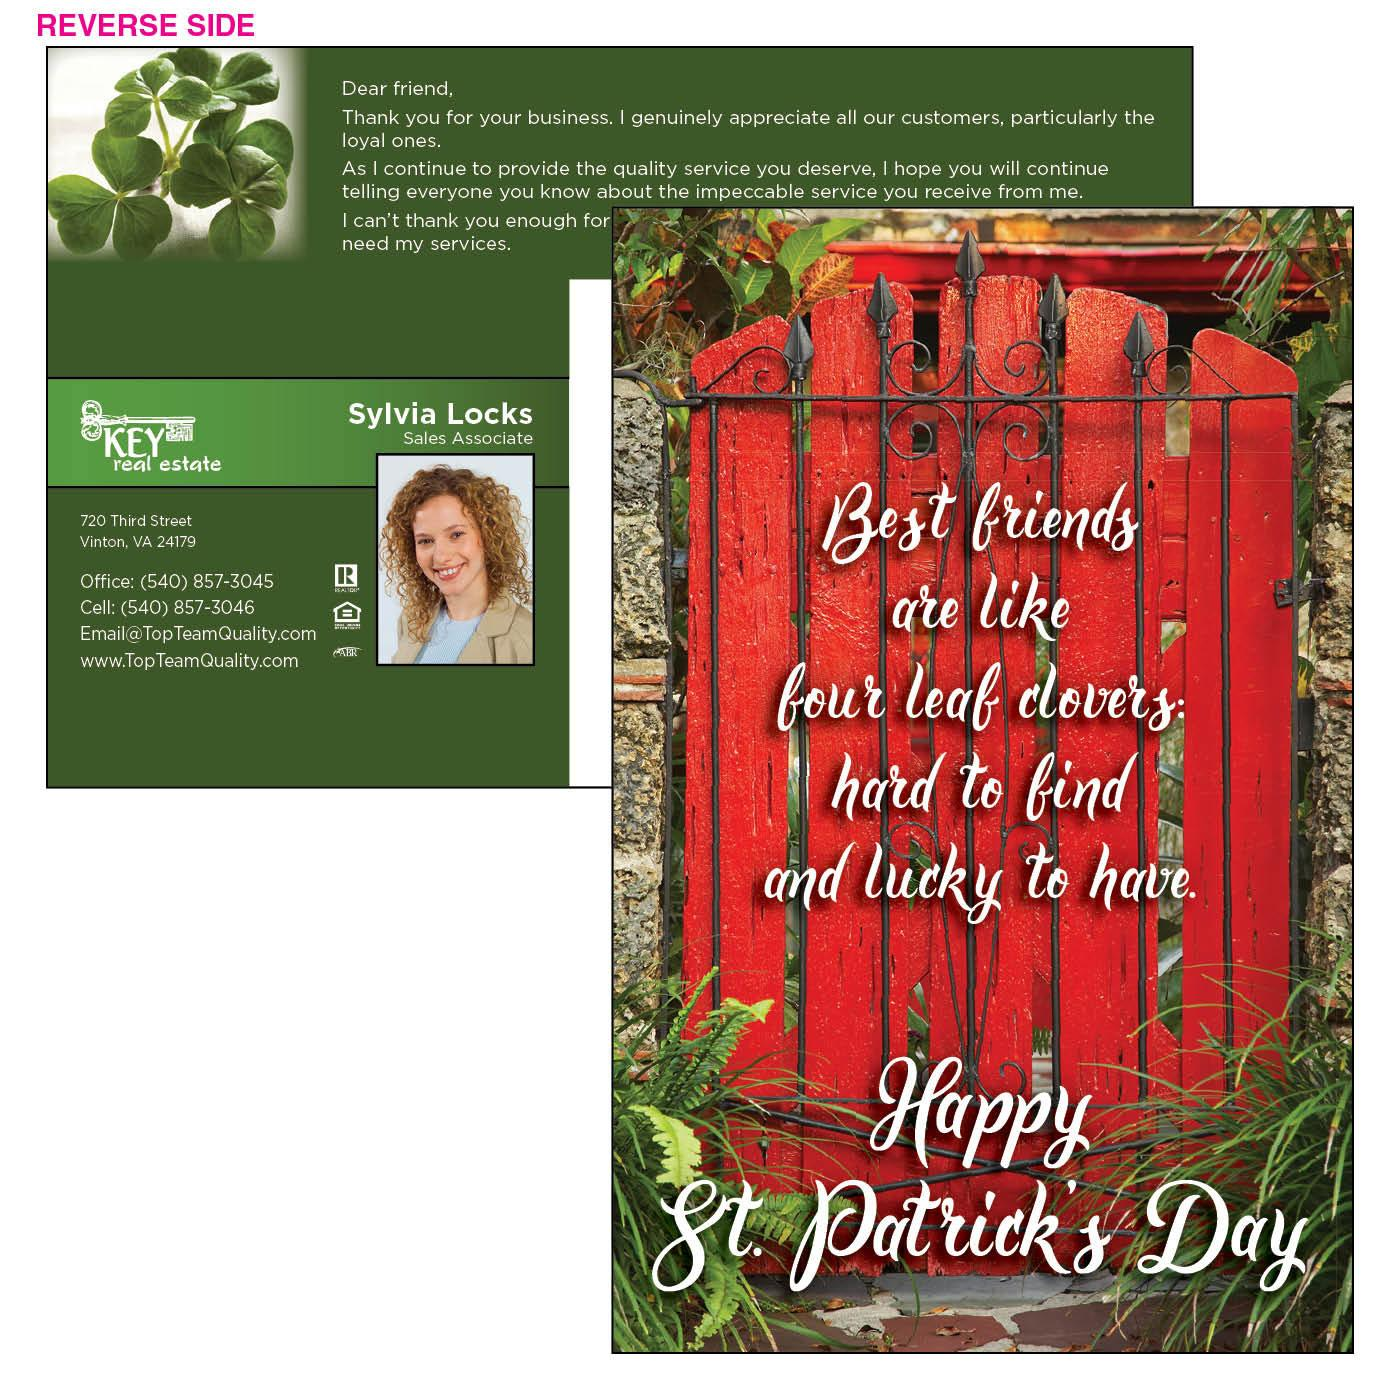 St. Patrick's Day Jumbo Postcard